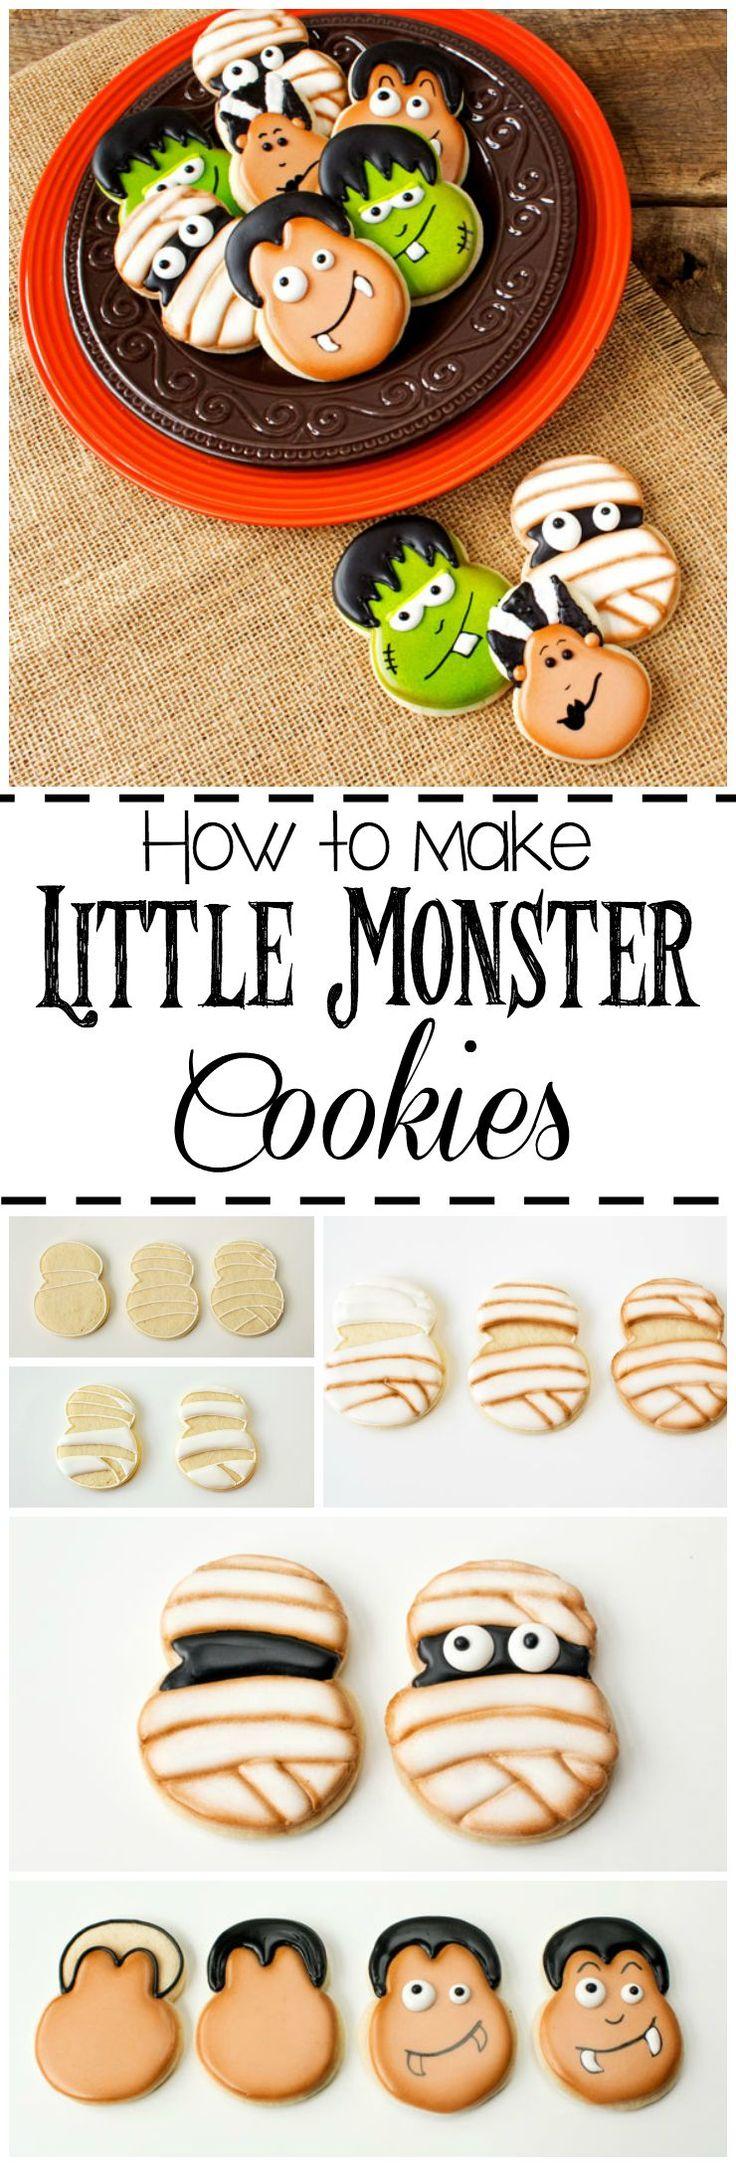 How to Make Little Monster Cookies via www.thebearfootbaker.com